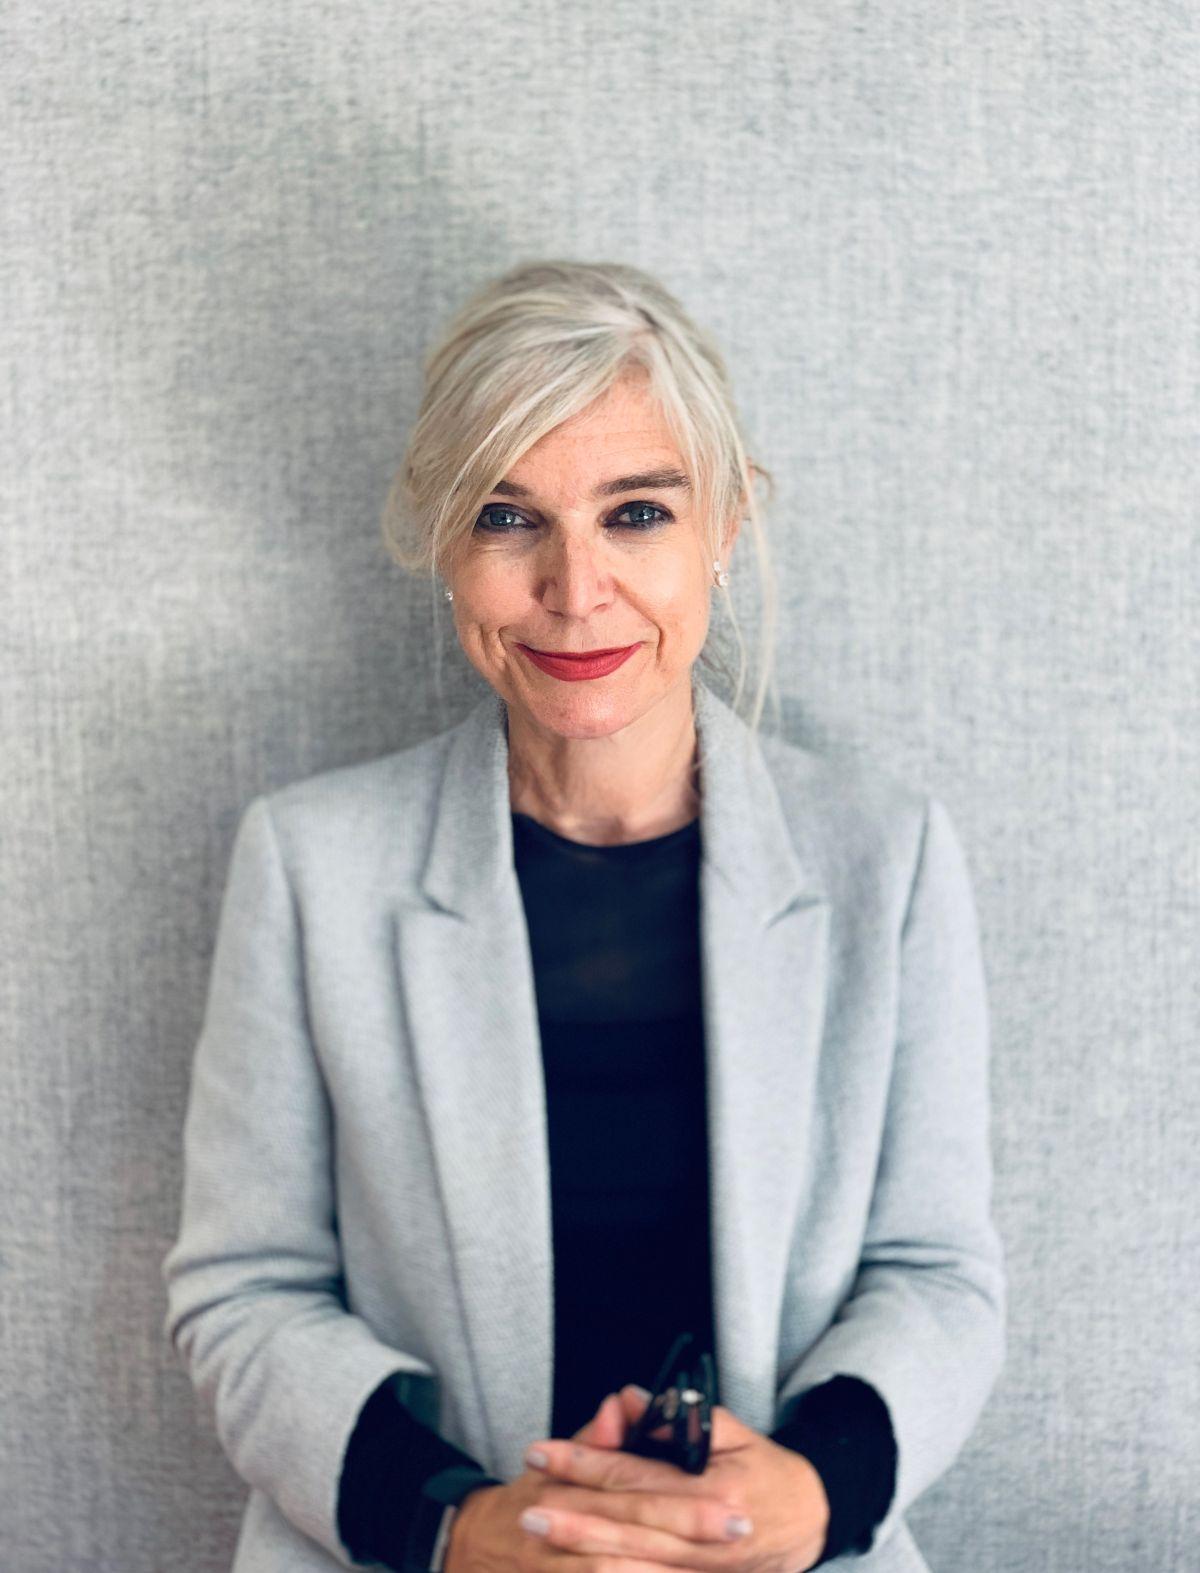 IWD2020: Creative Women Profile - Christine Cort